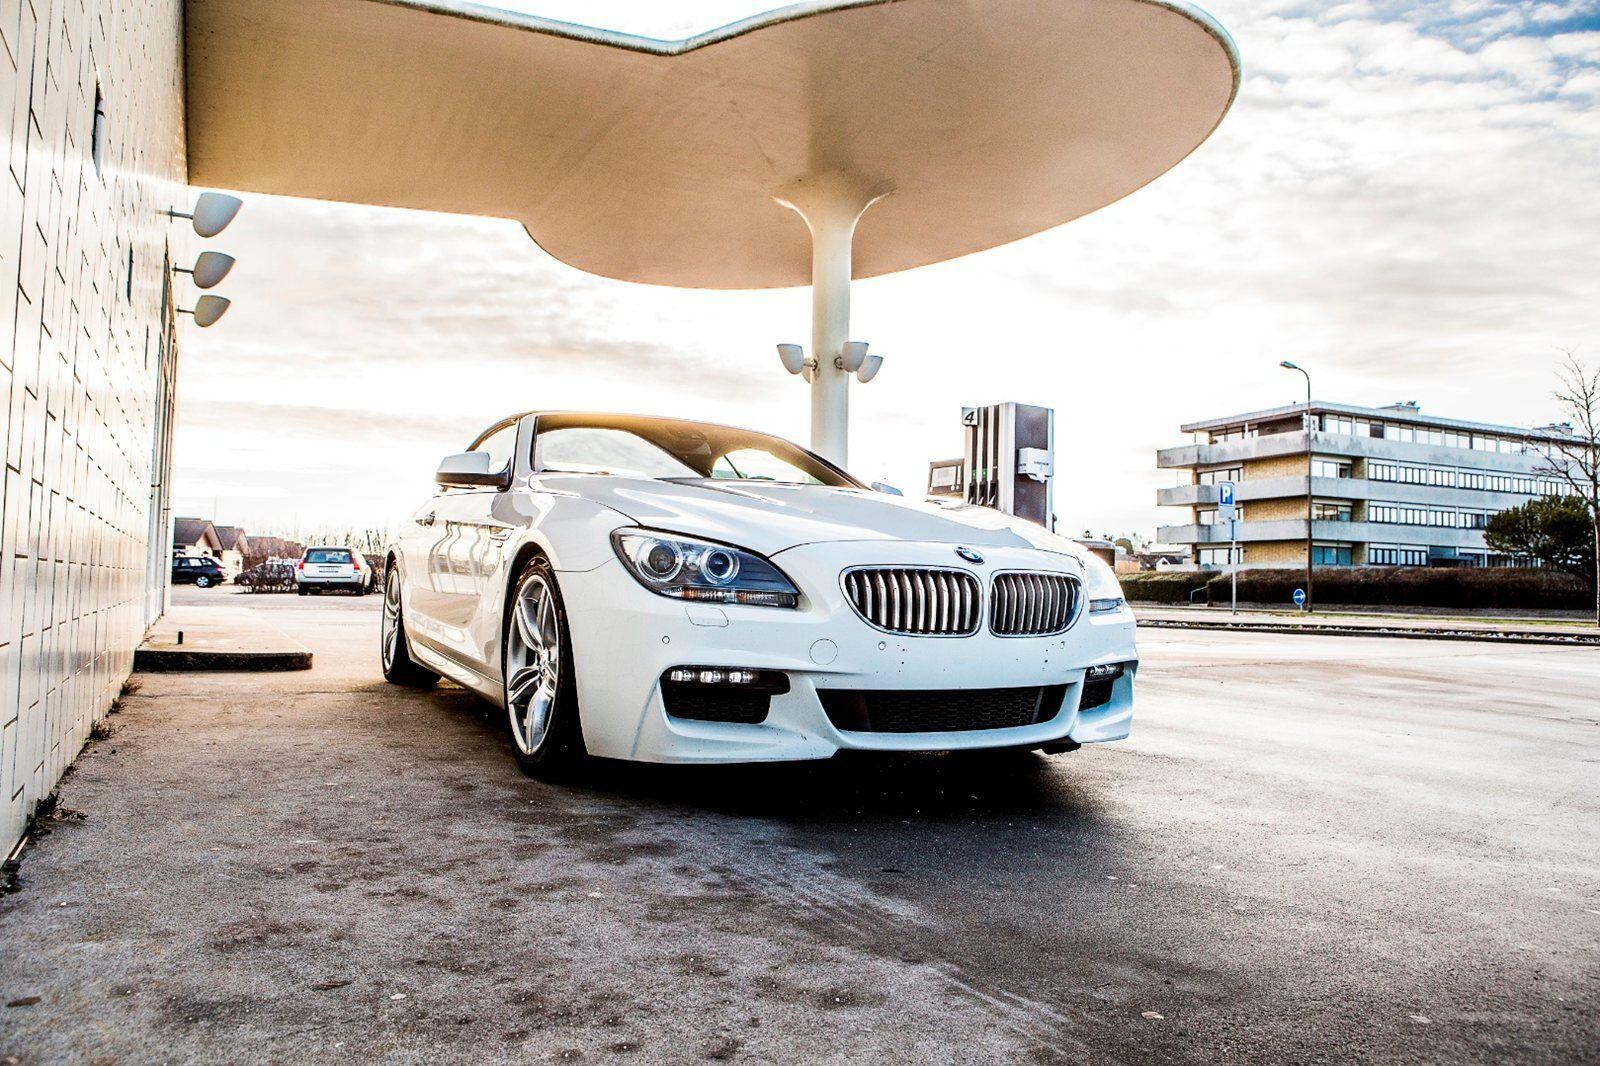 BMW 650i 4,4 Cabriolet aut. 2d - 3.530 kr.